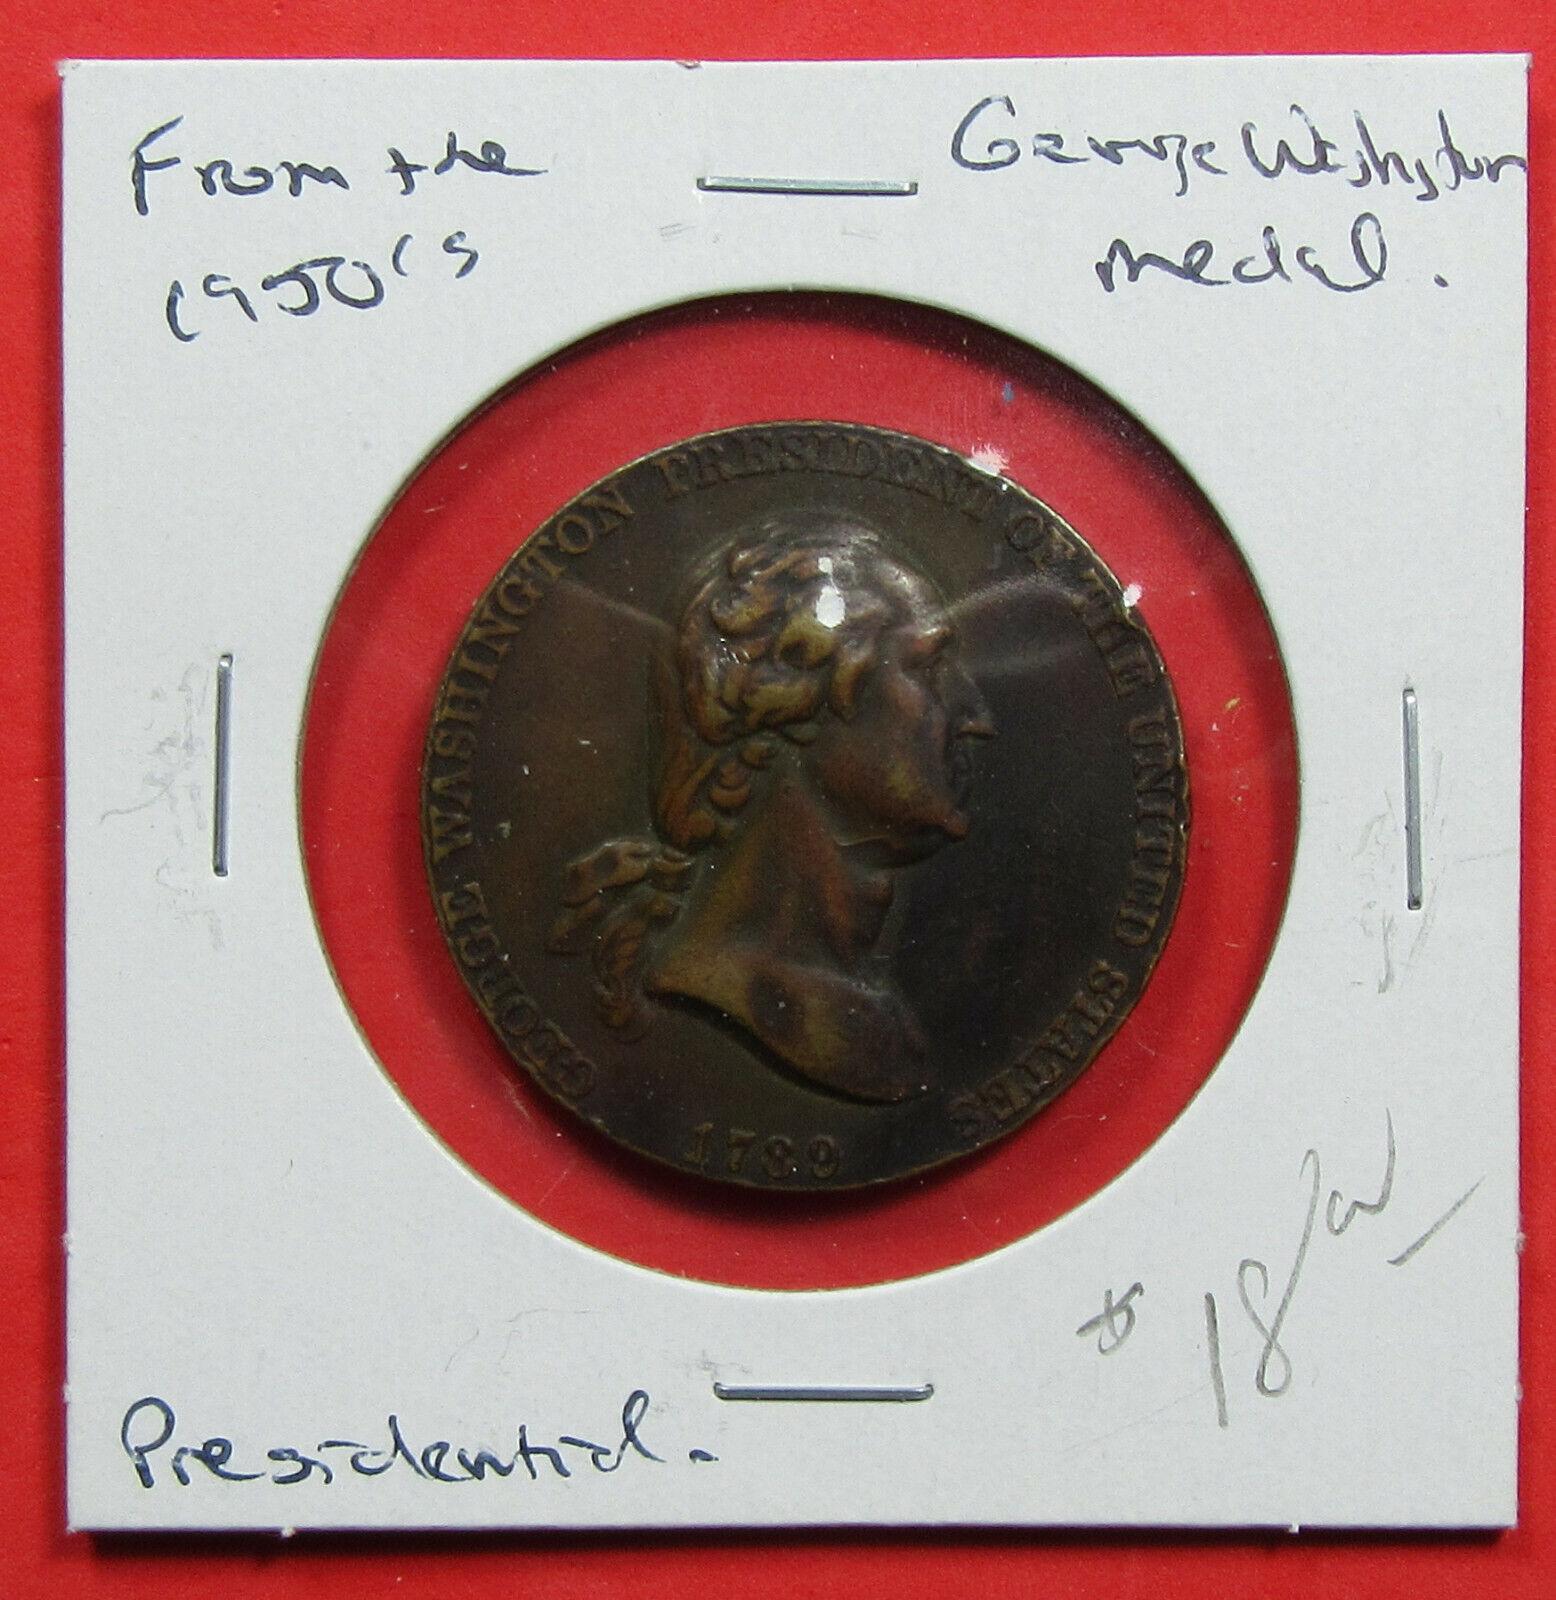 1950 s George Washington Medal. High Relief Strike. Presidential. 720117  - $18.00